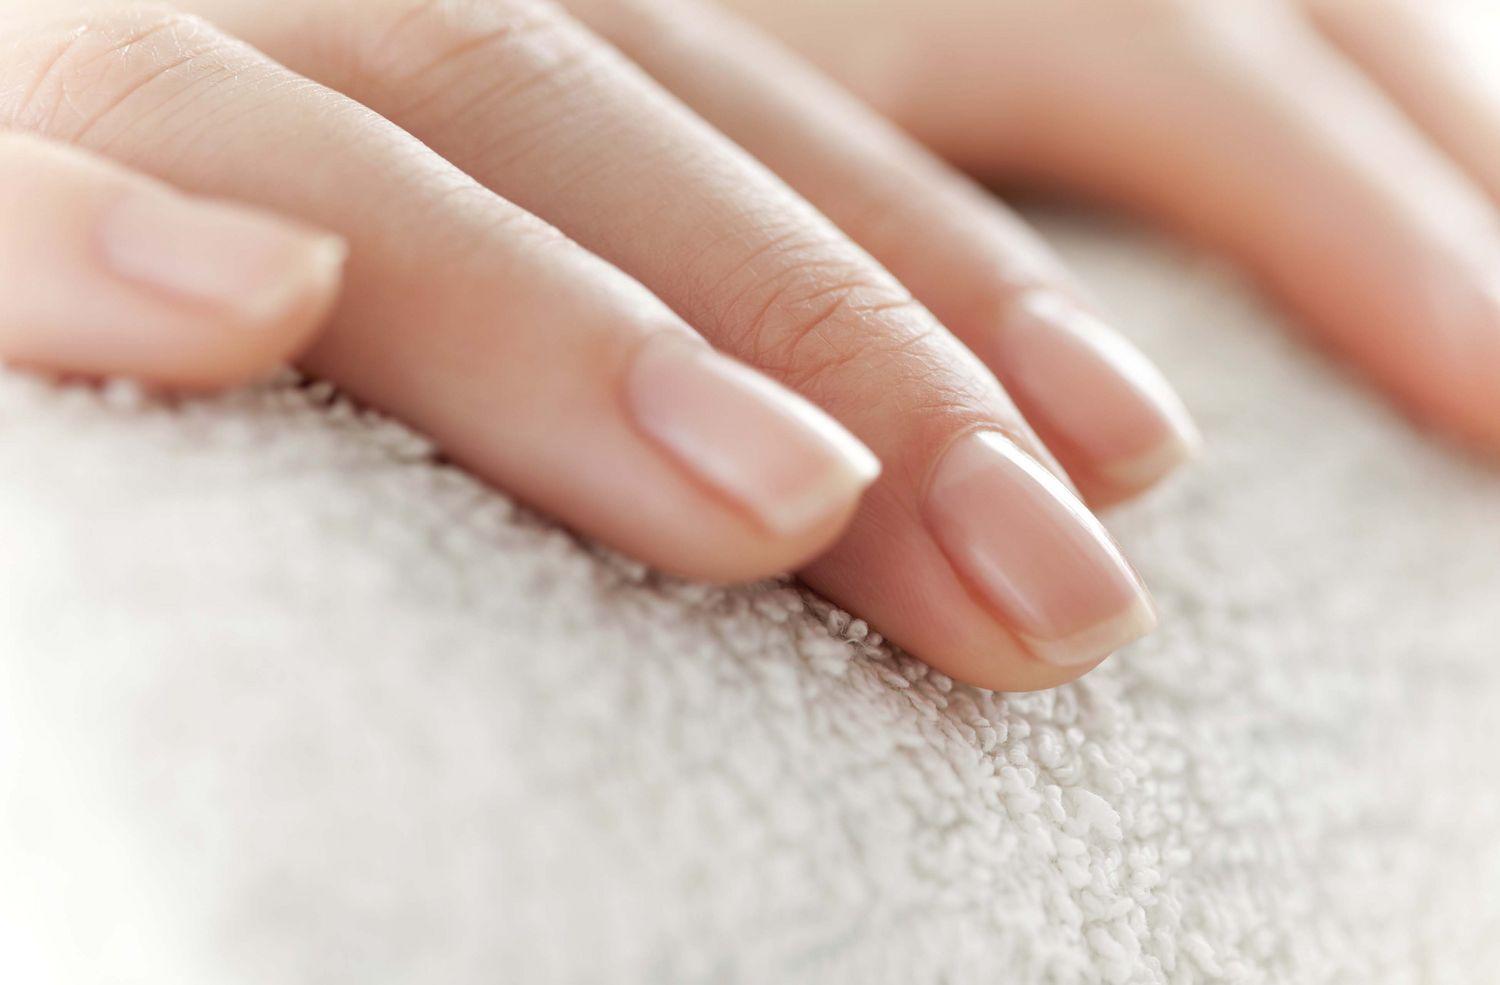 gel-manicure-dermatologist-nail-healthy-main